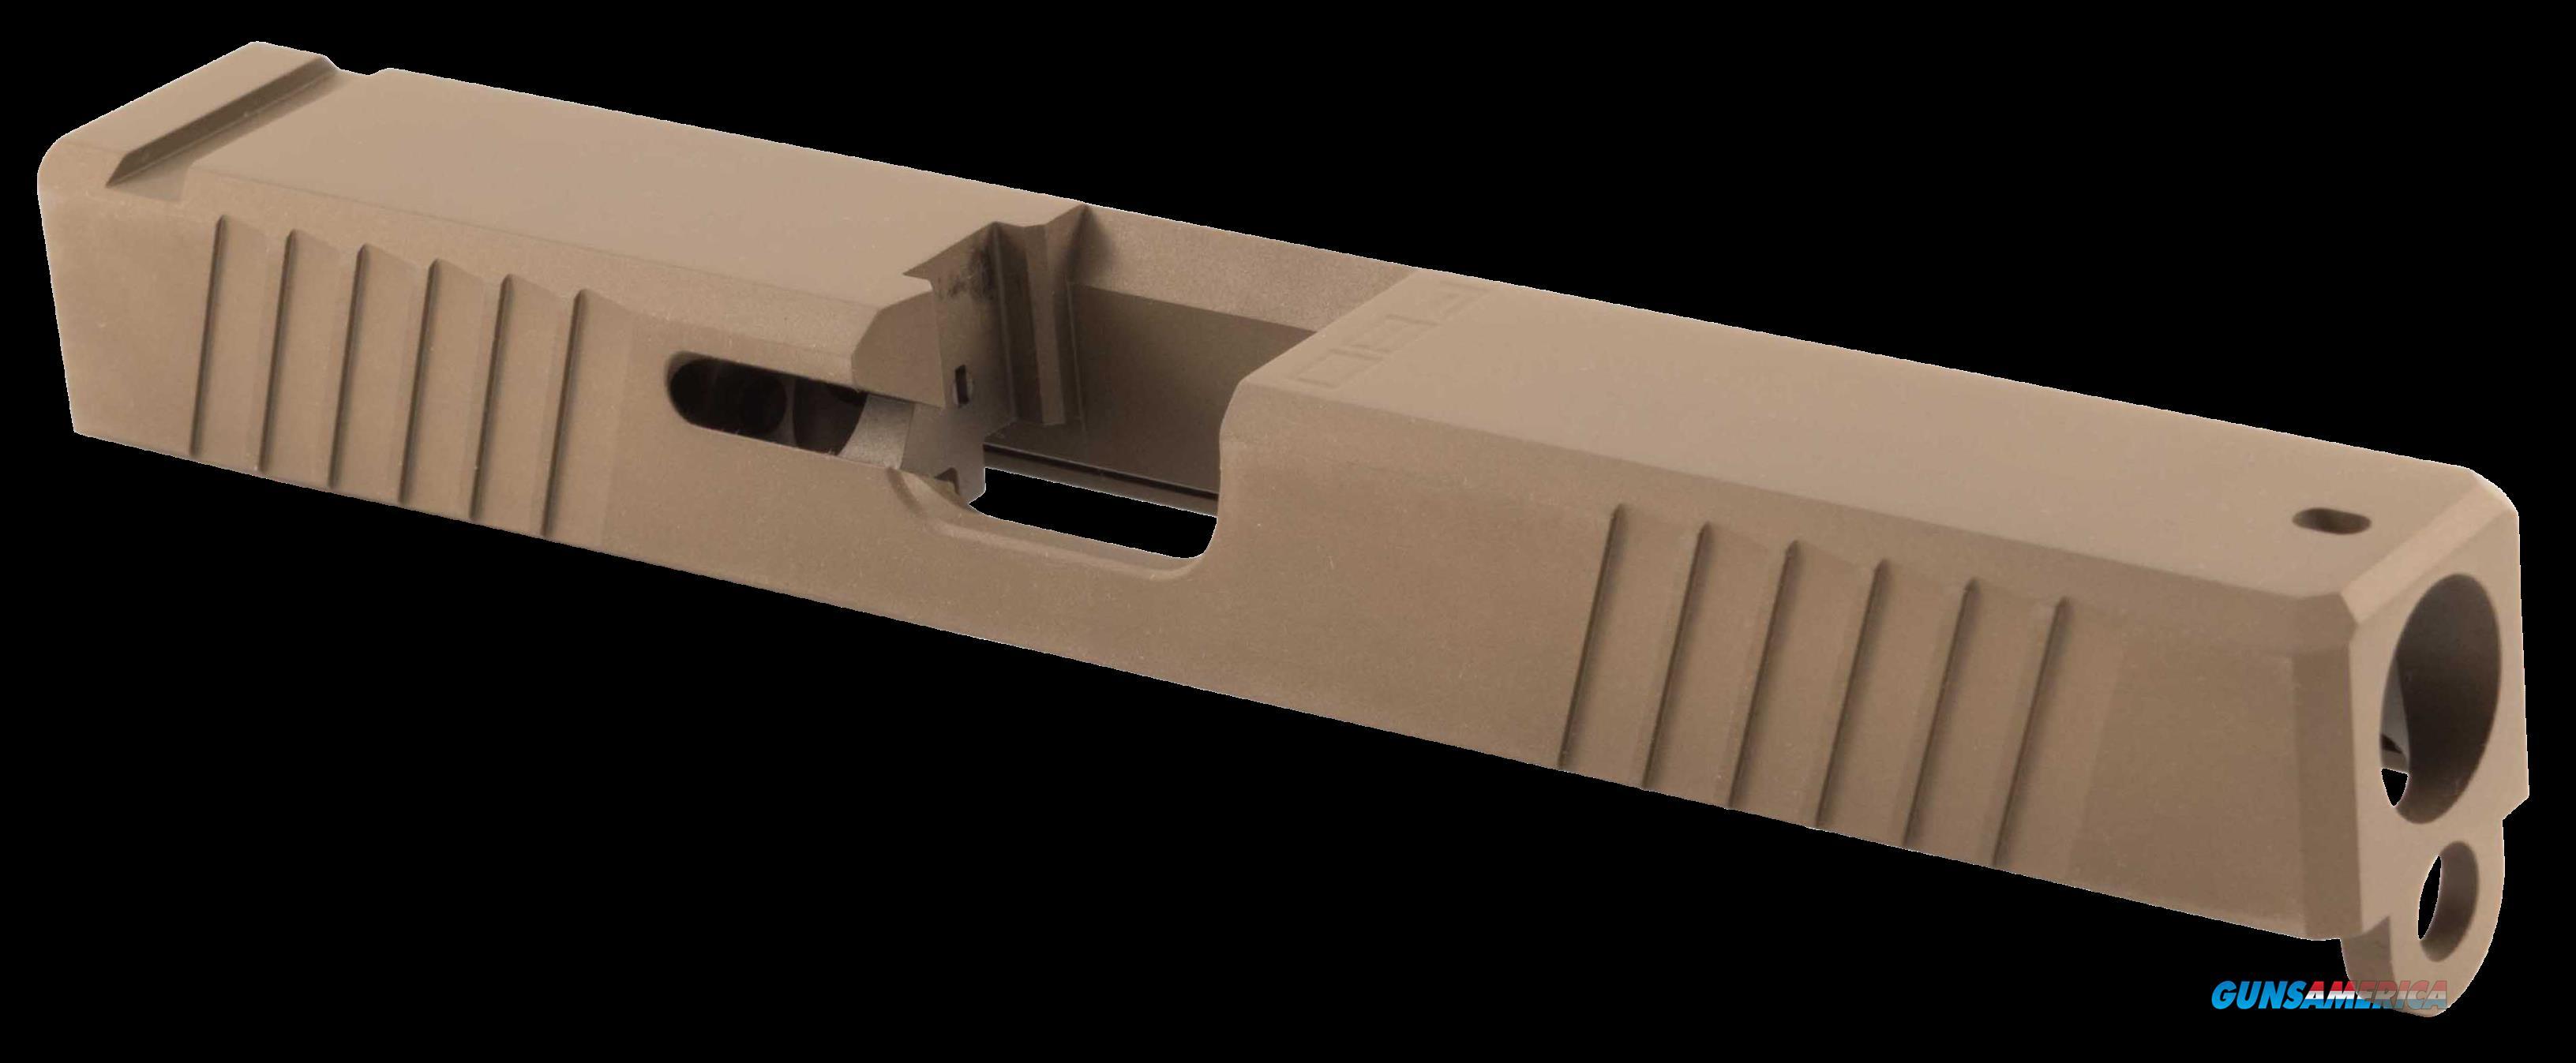 Polymer80 G17 Gen3 Compatible, P80 Ps9-std-fde       Glk 17 Dlc Slide G3 Standard  Guns > Pistols > 1911 Pistol Copies (non-Colt)